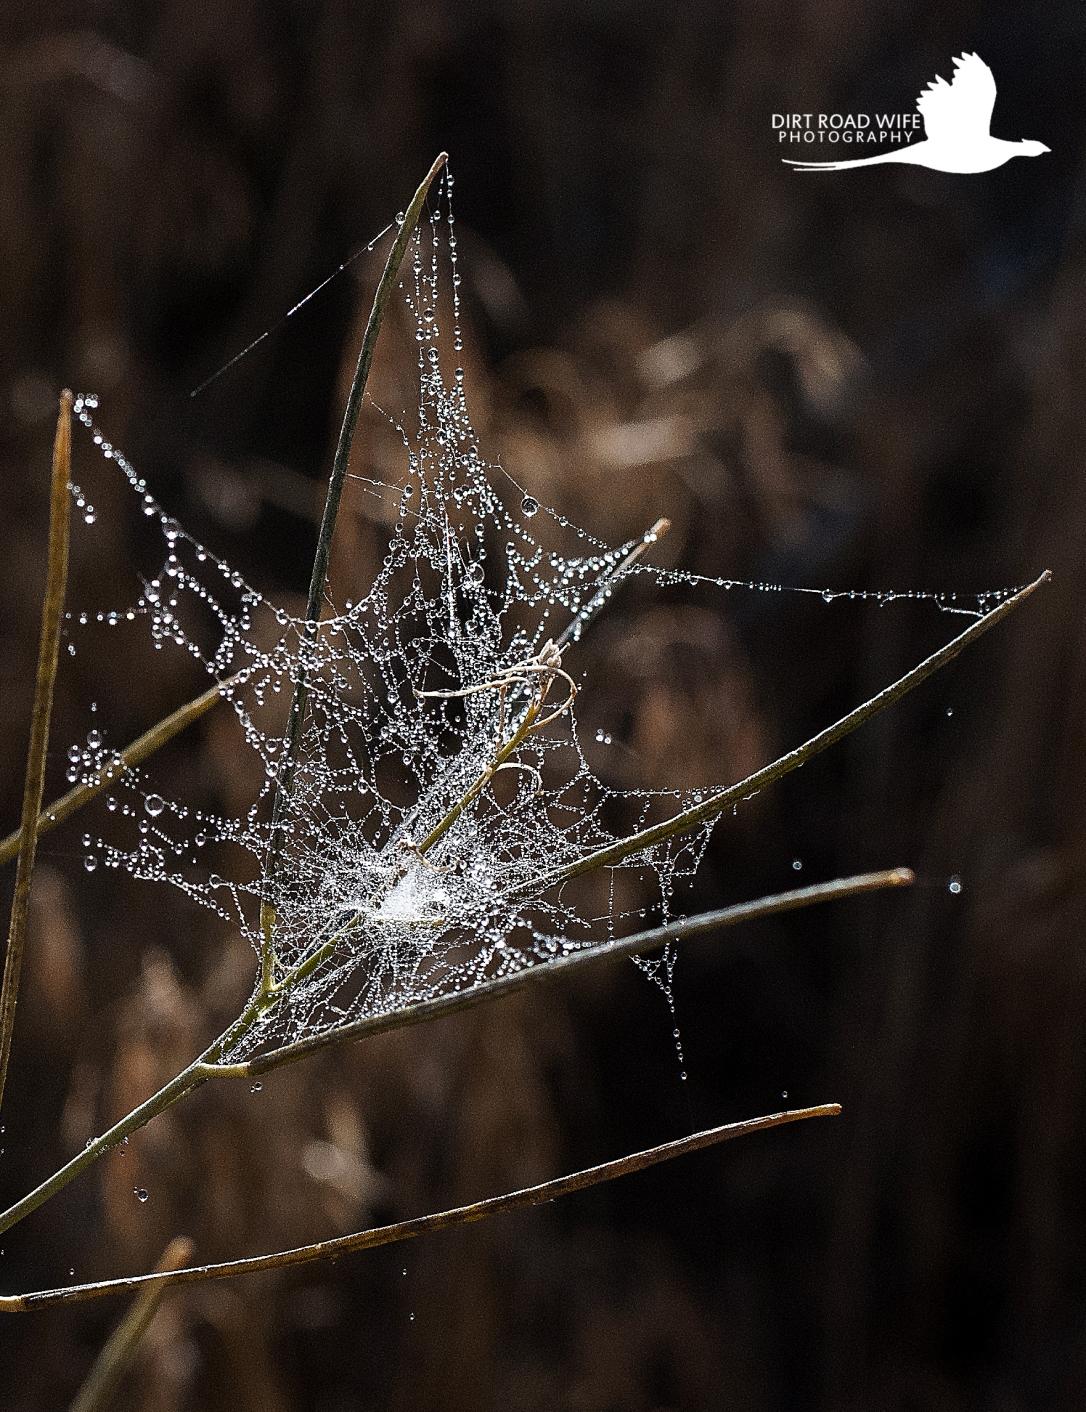 Spider Web 1 CR